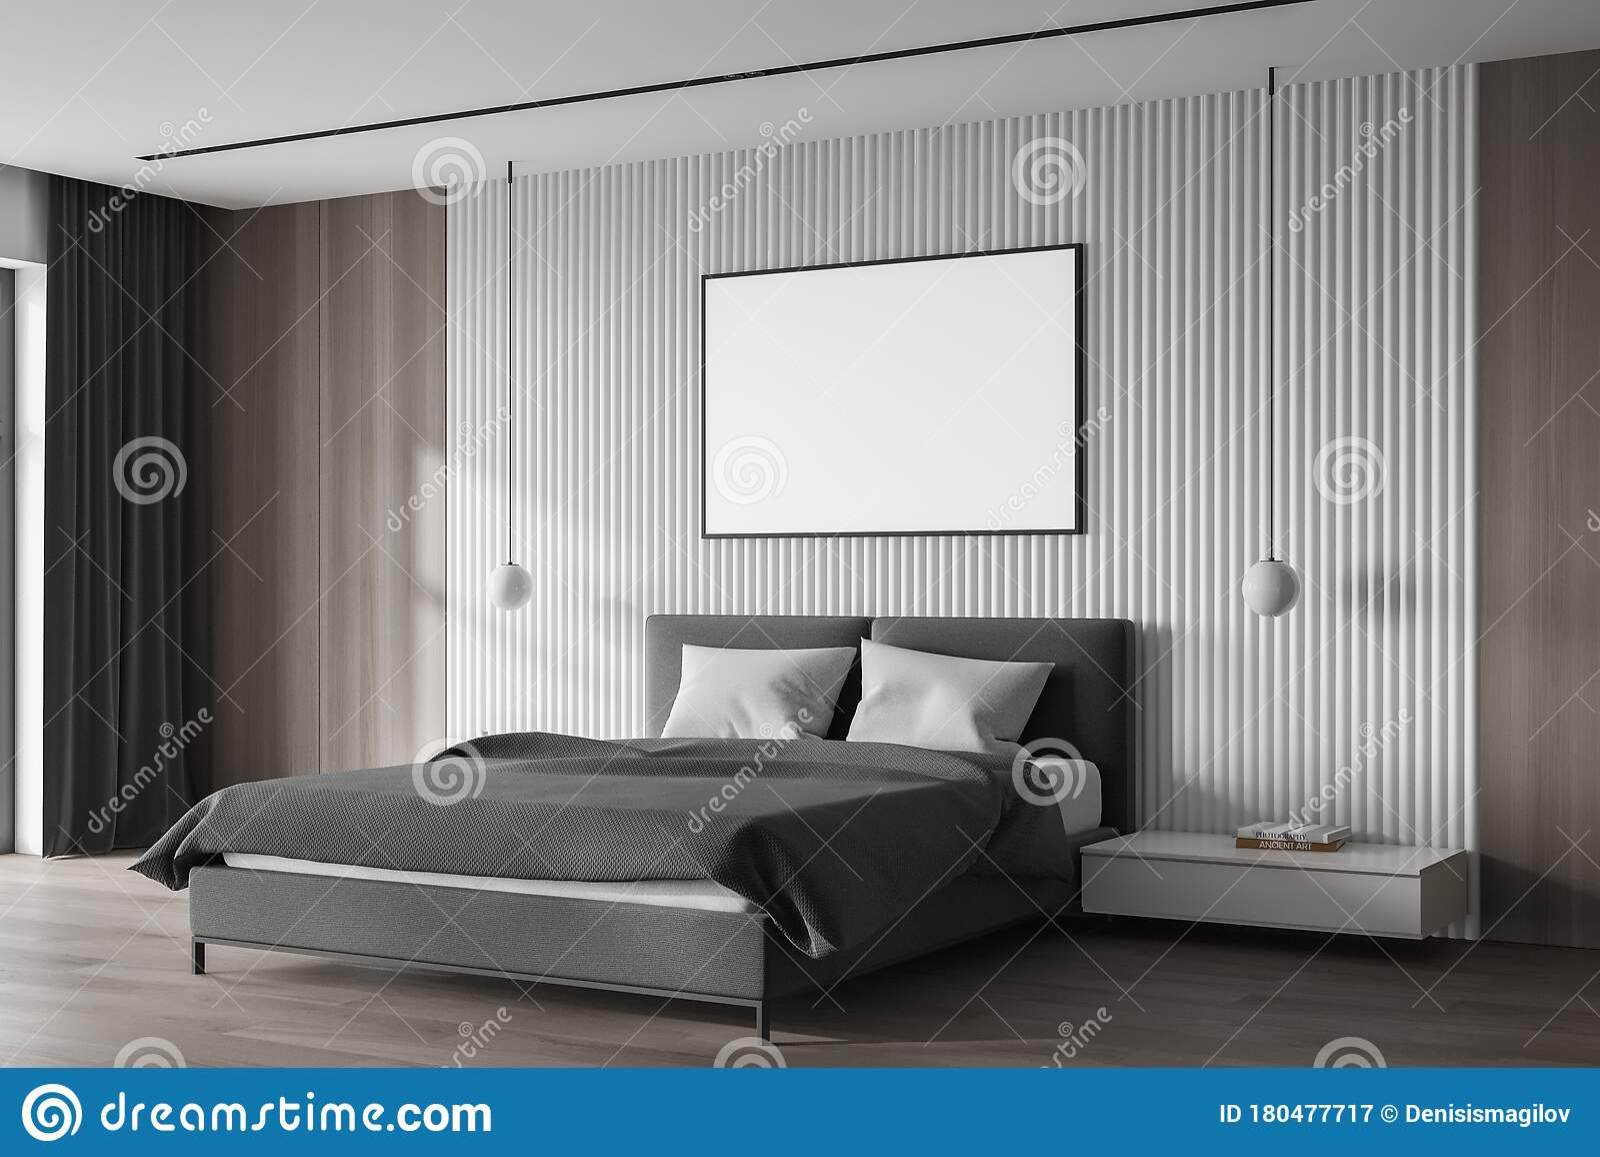 White Master Bedroom Corner With Poster Stock Illustration Illustration Of Empty Bedside 180477717